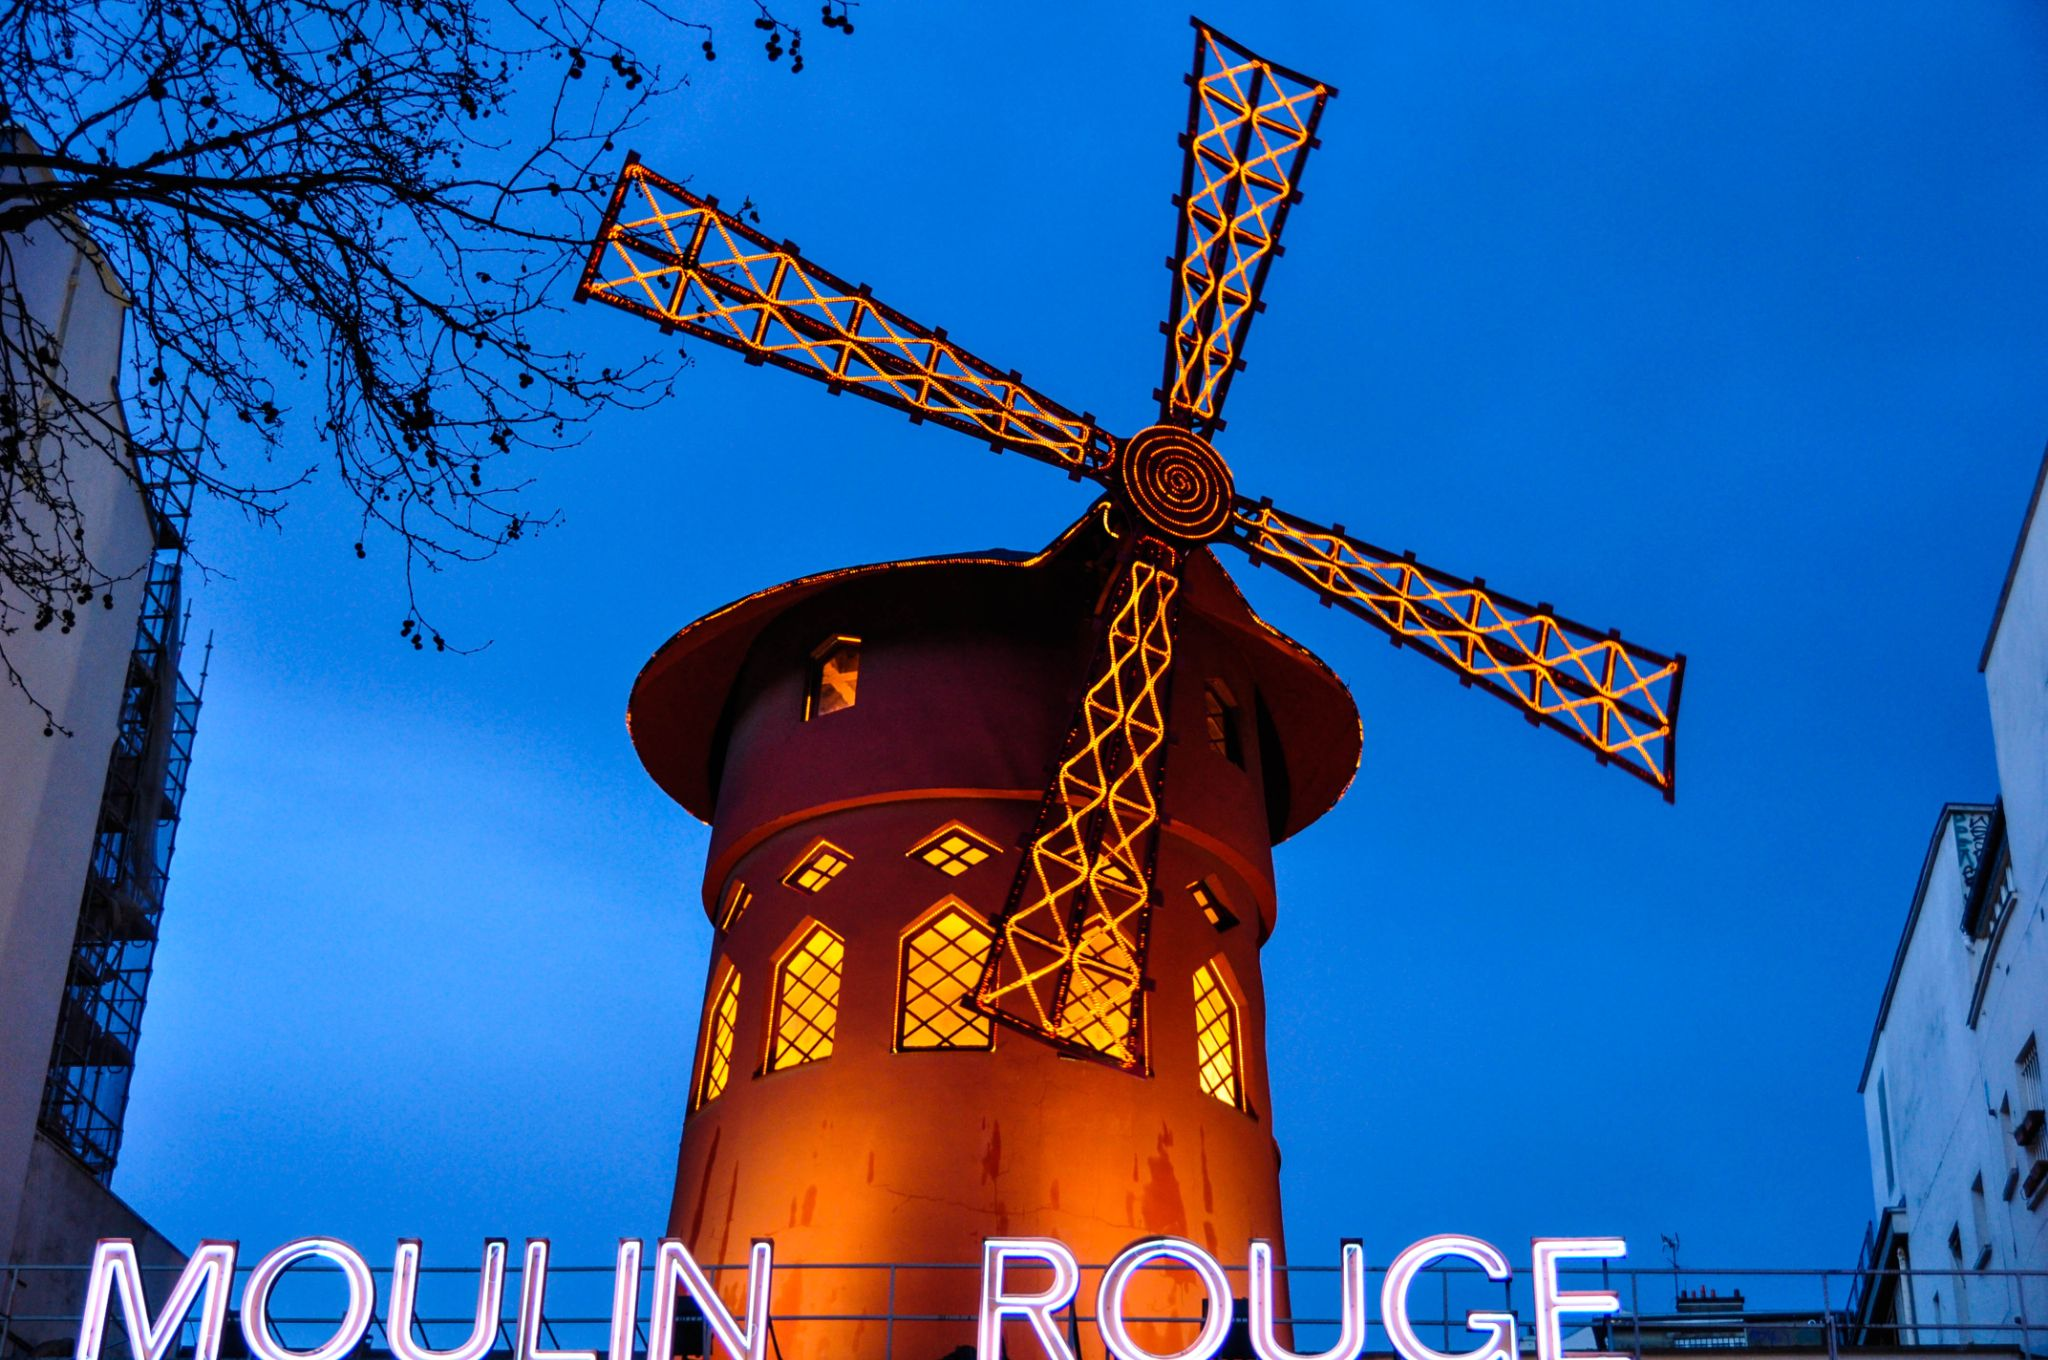 Moulin by tamara.seles